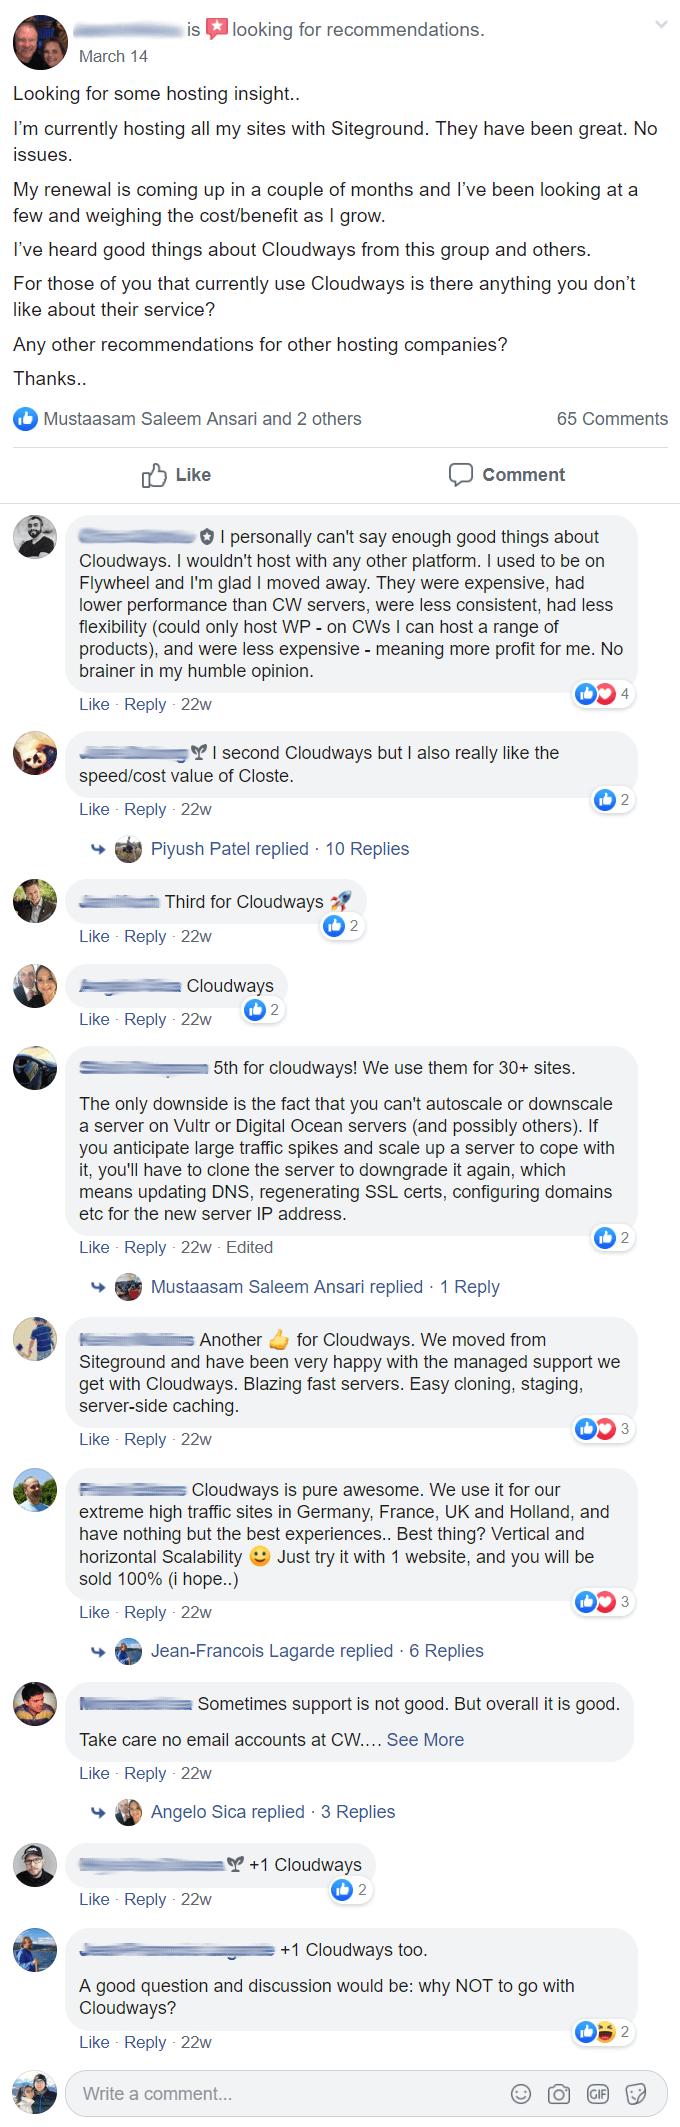 Hosting recommendations - Facebook thread